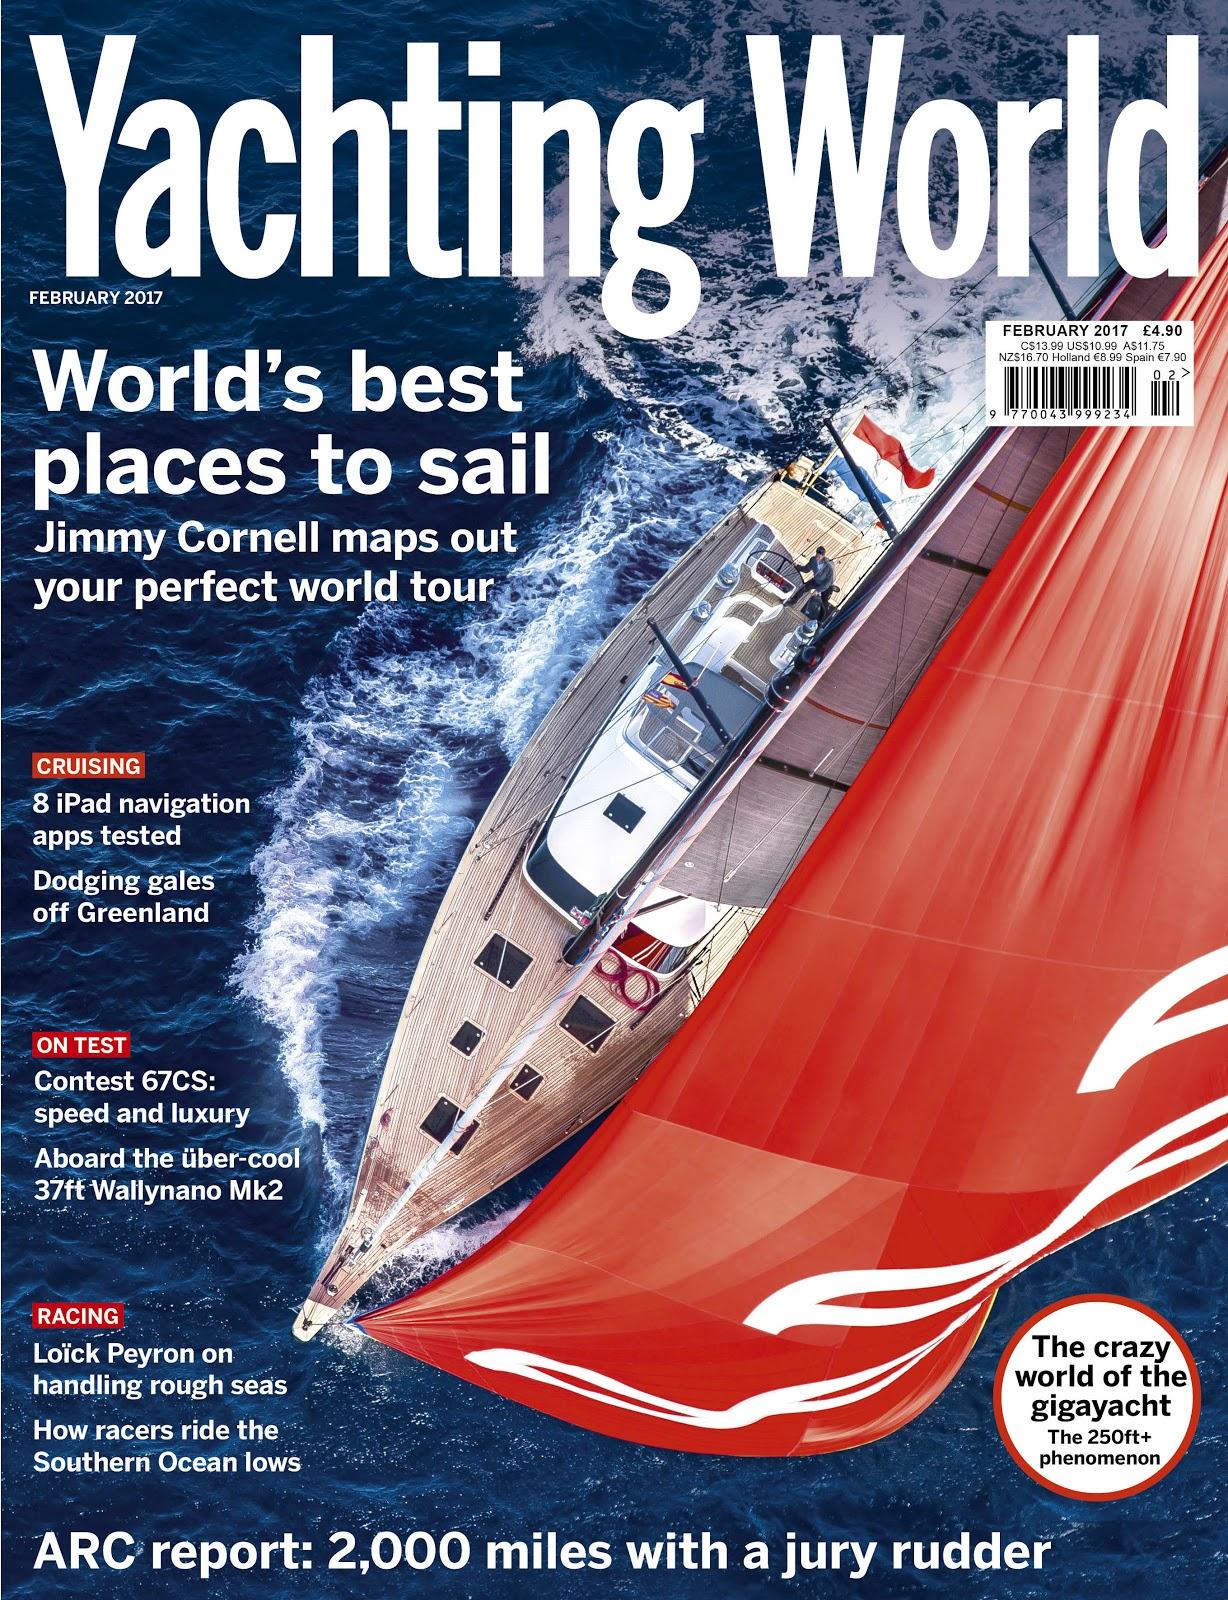 yachting world online